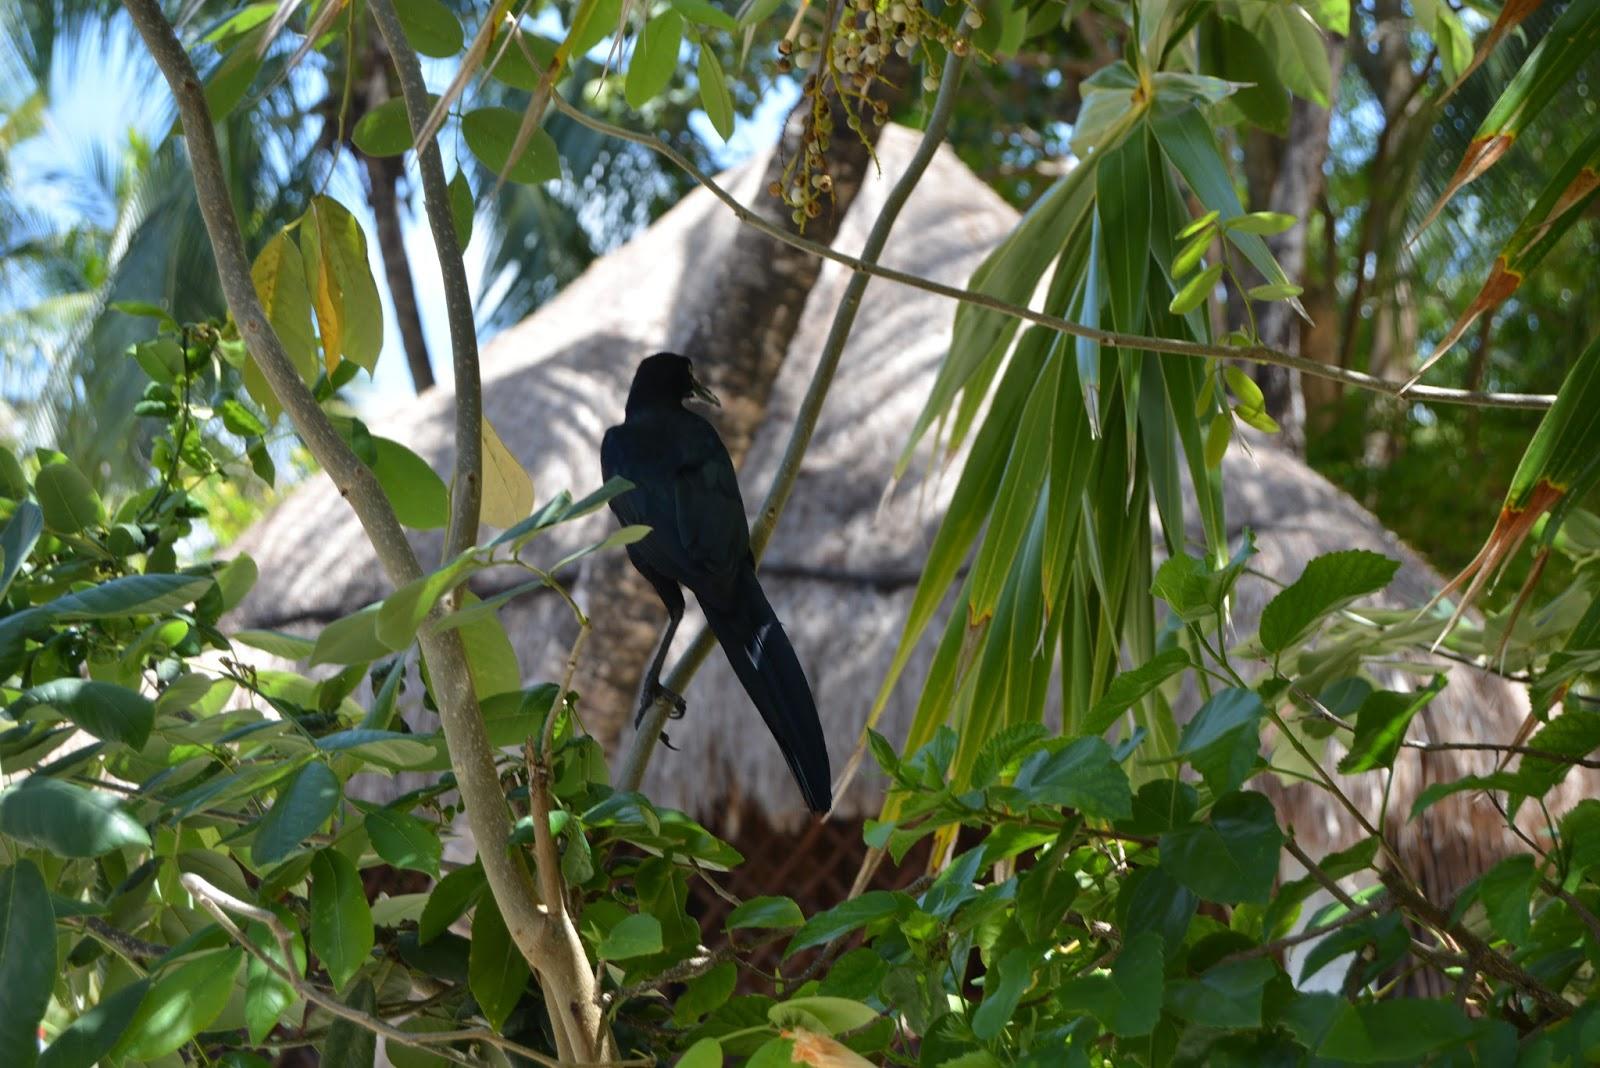 wildlife, nature, bird, holiday, mexico, playa del carmen, travel, traveling, trees, palm trees